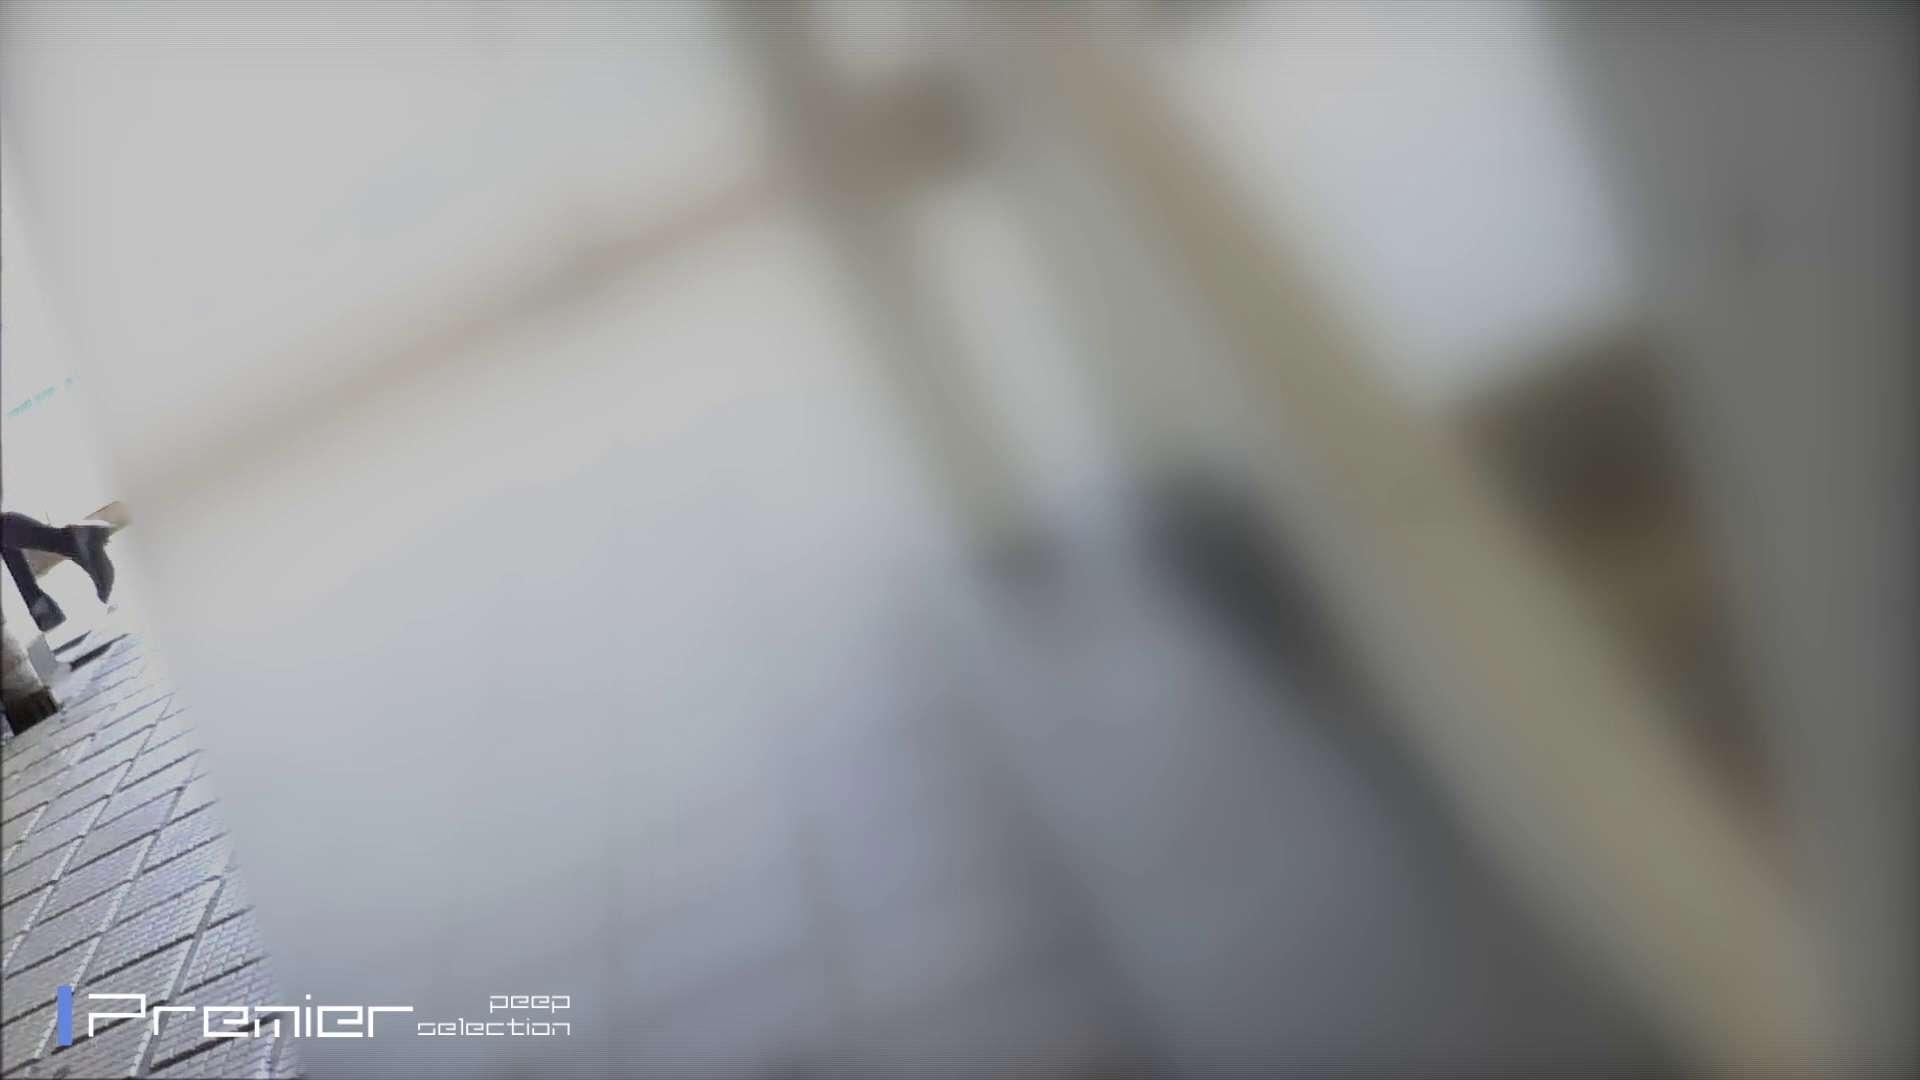 FHD激カワ!激やば! 復讐のトイレ盗撮 Vol.03 名作殿堂  78PIX 52